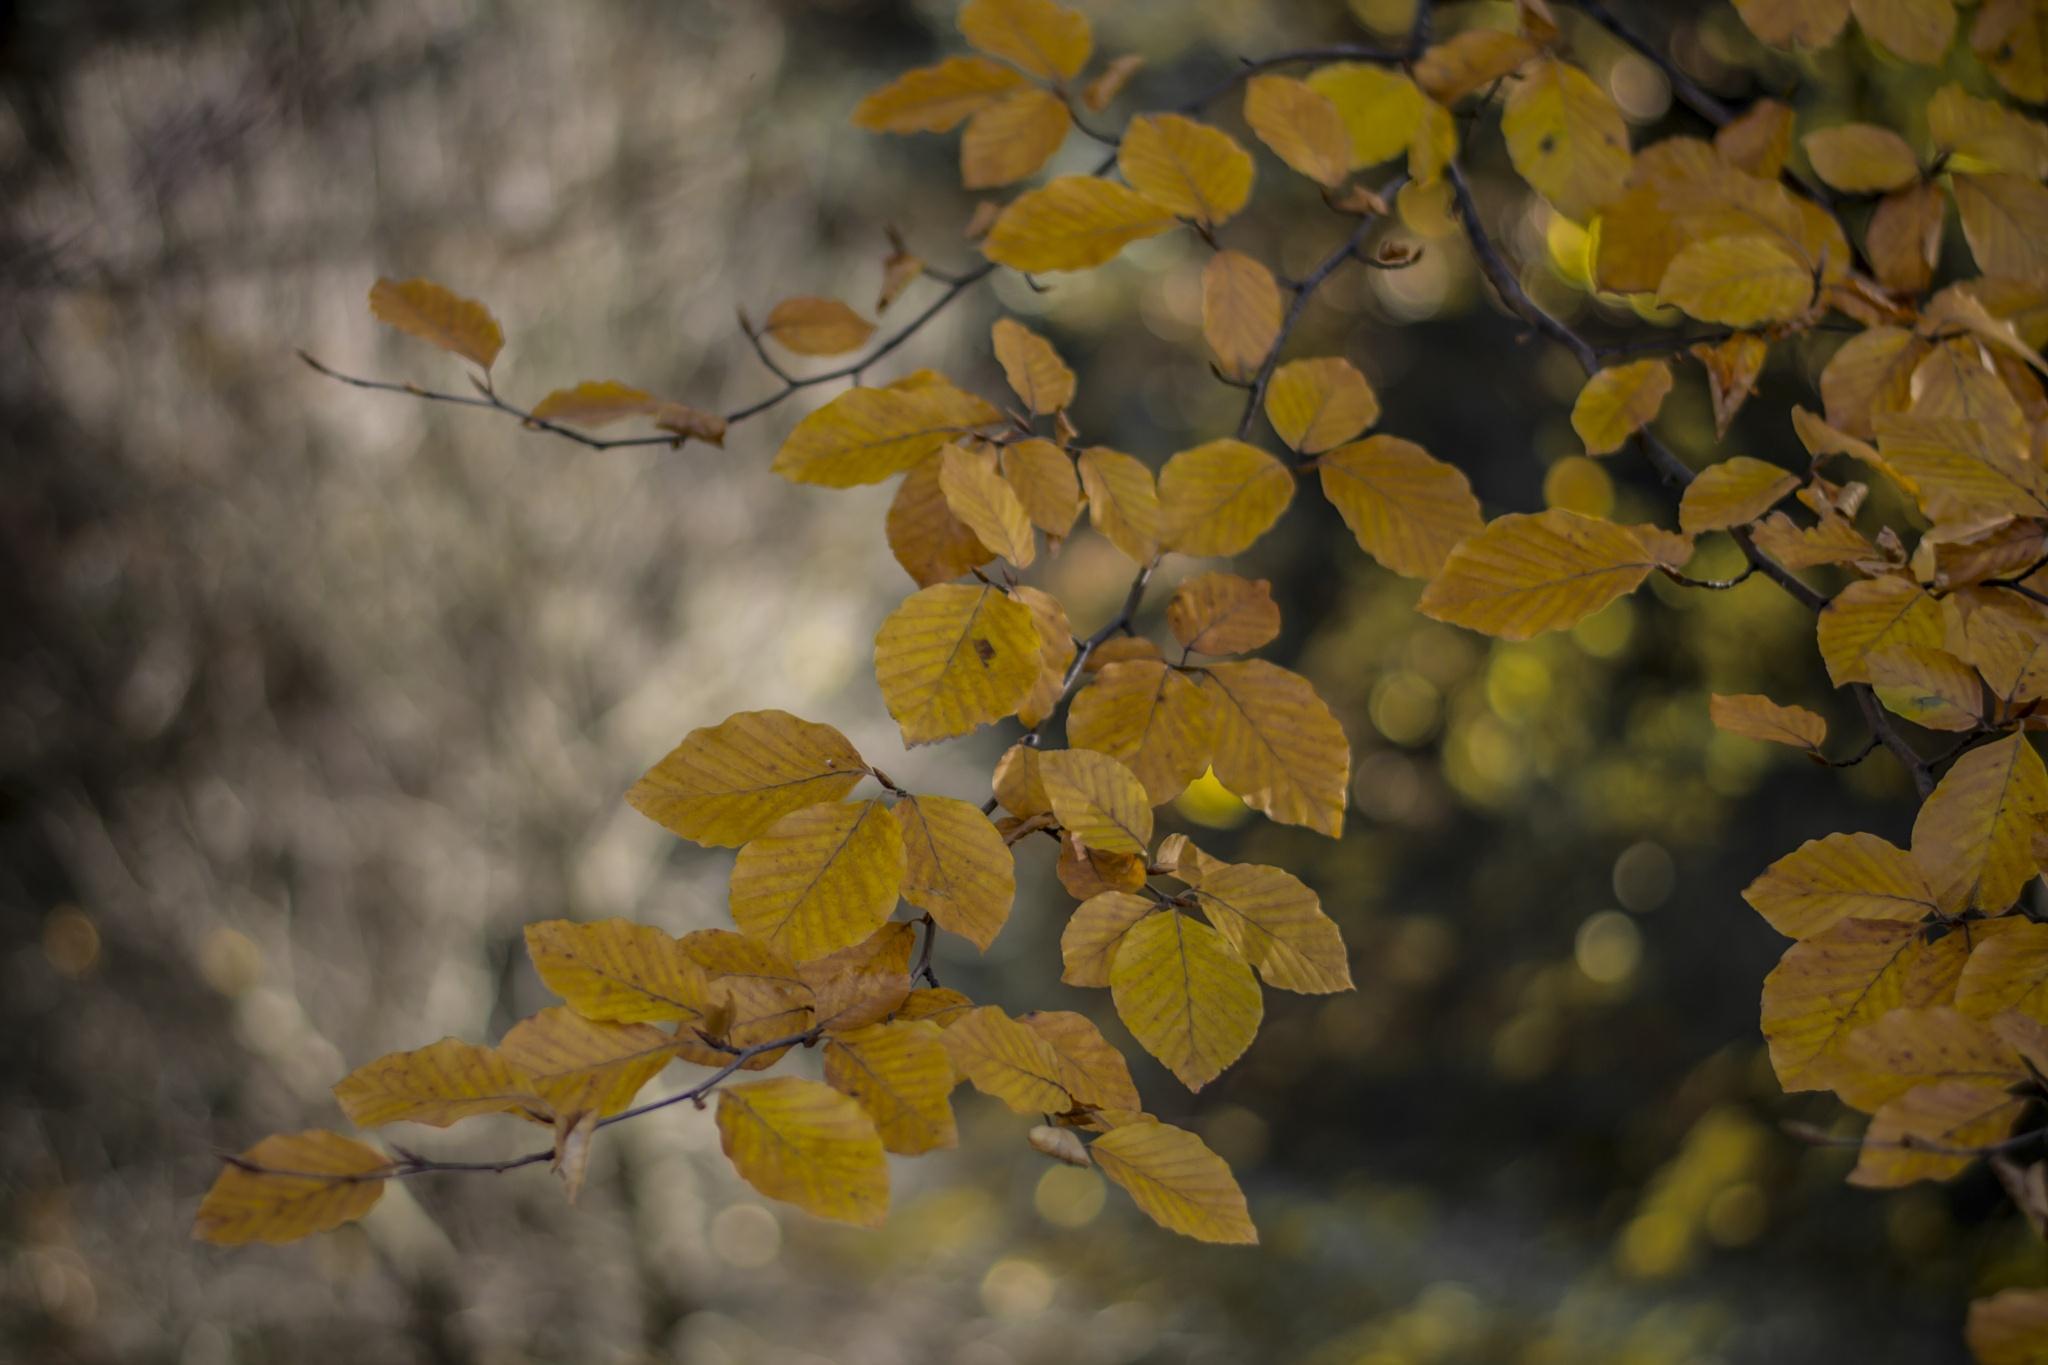 autumn leaves by Roman Borshovskyy